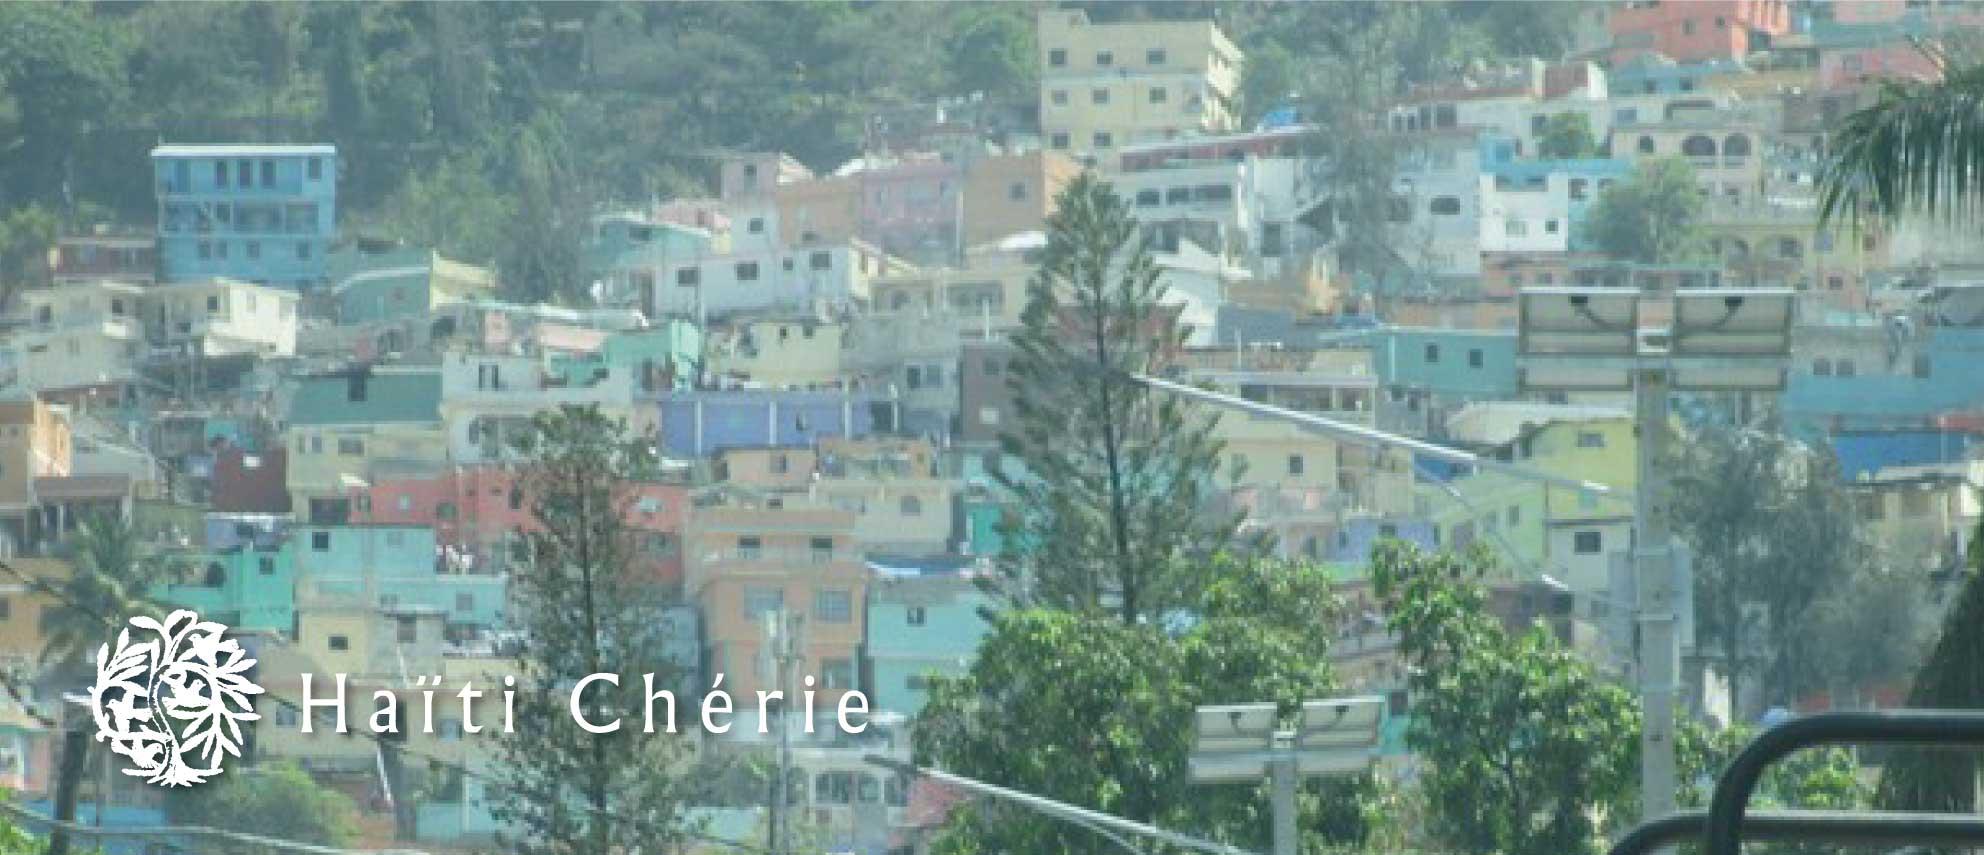 Haiti Cherie(ハイチシェリー)